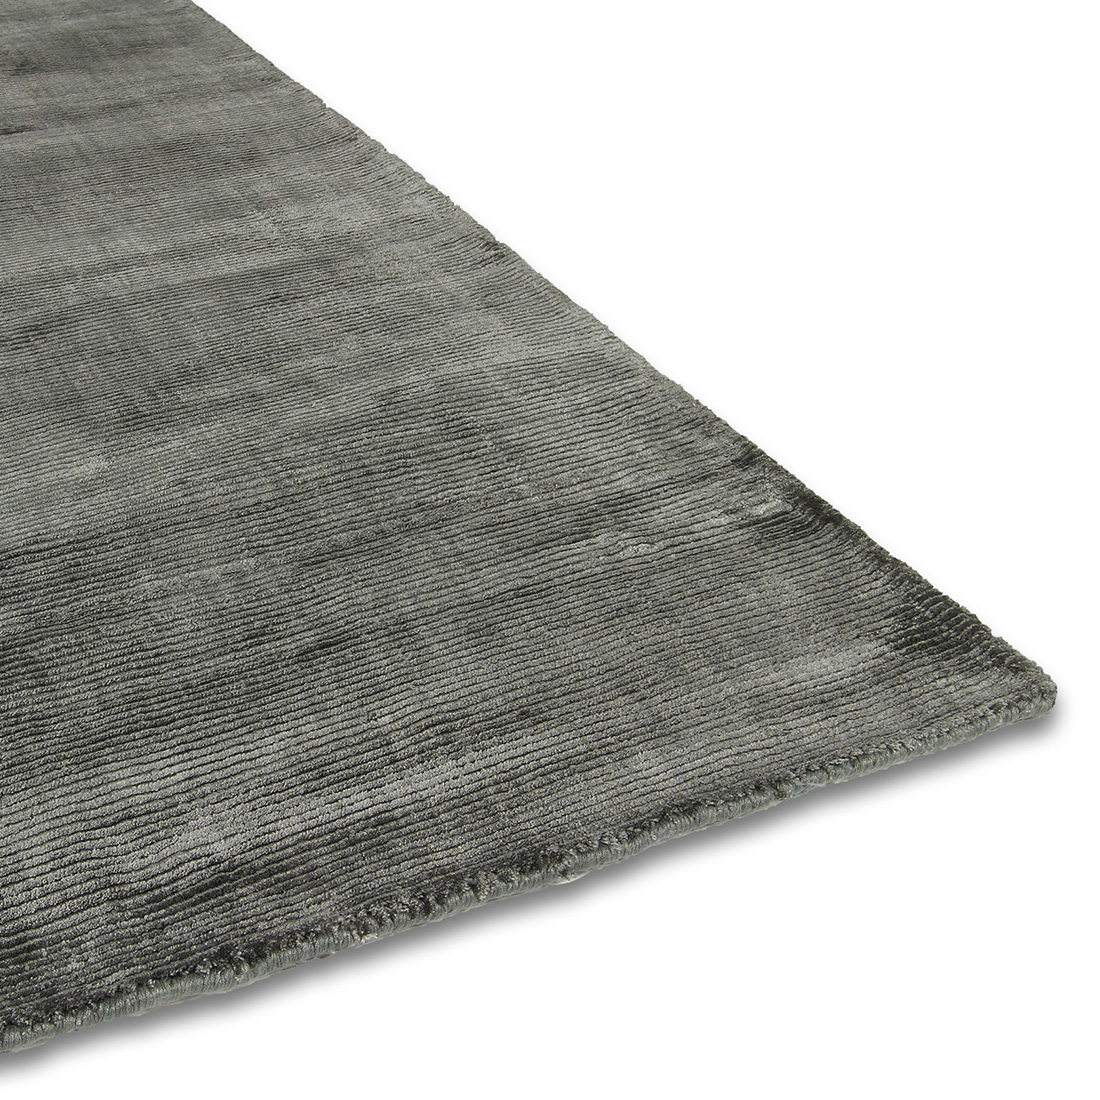 Vloerkleed Brinker Oyster Grey | 200 x 300 cm